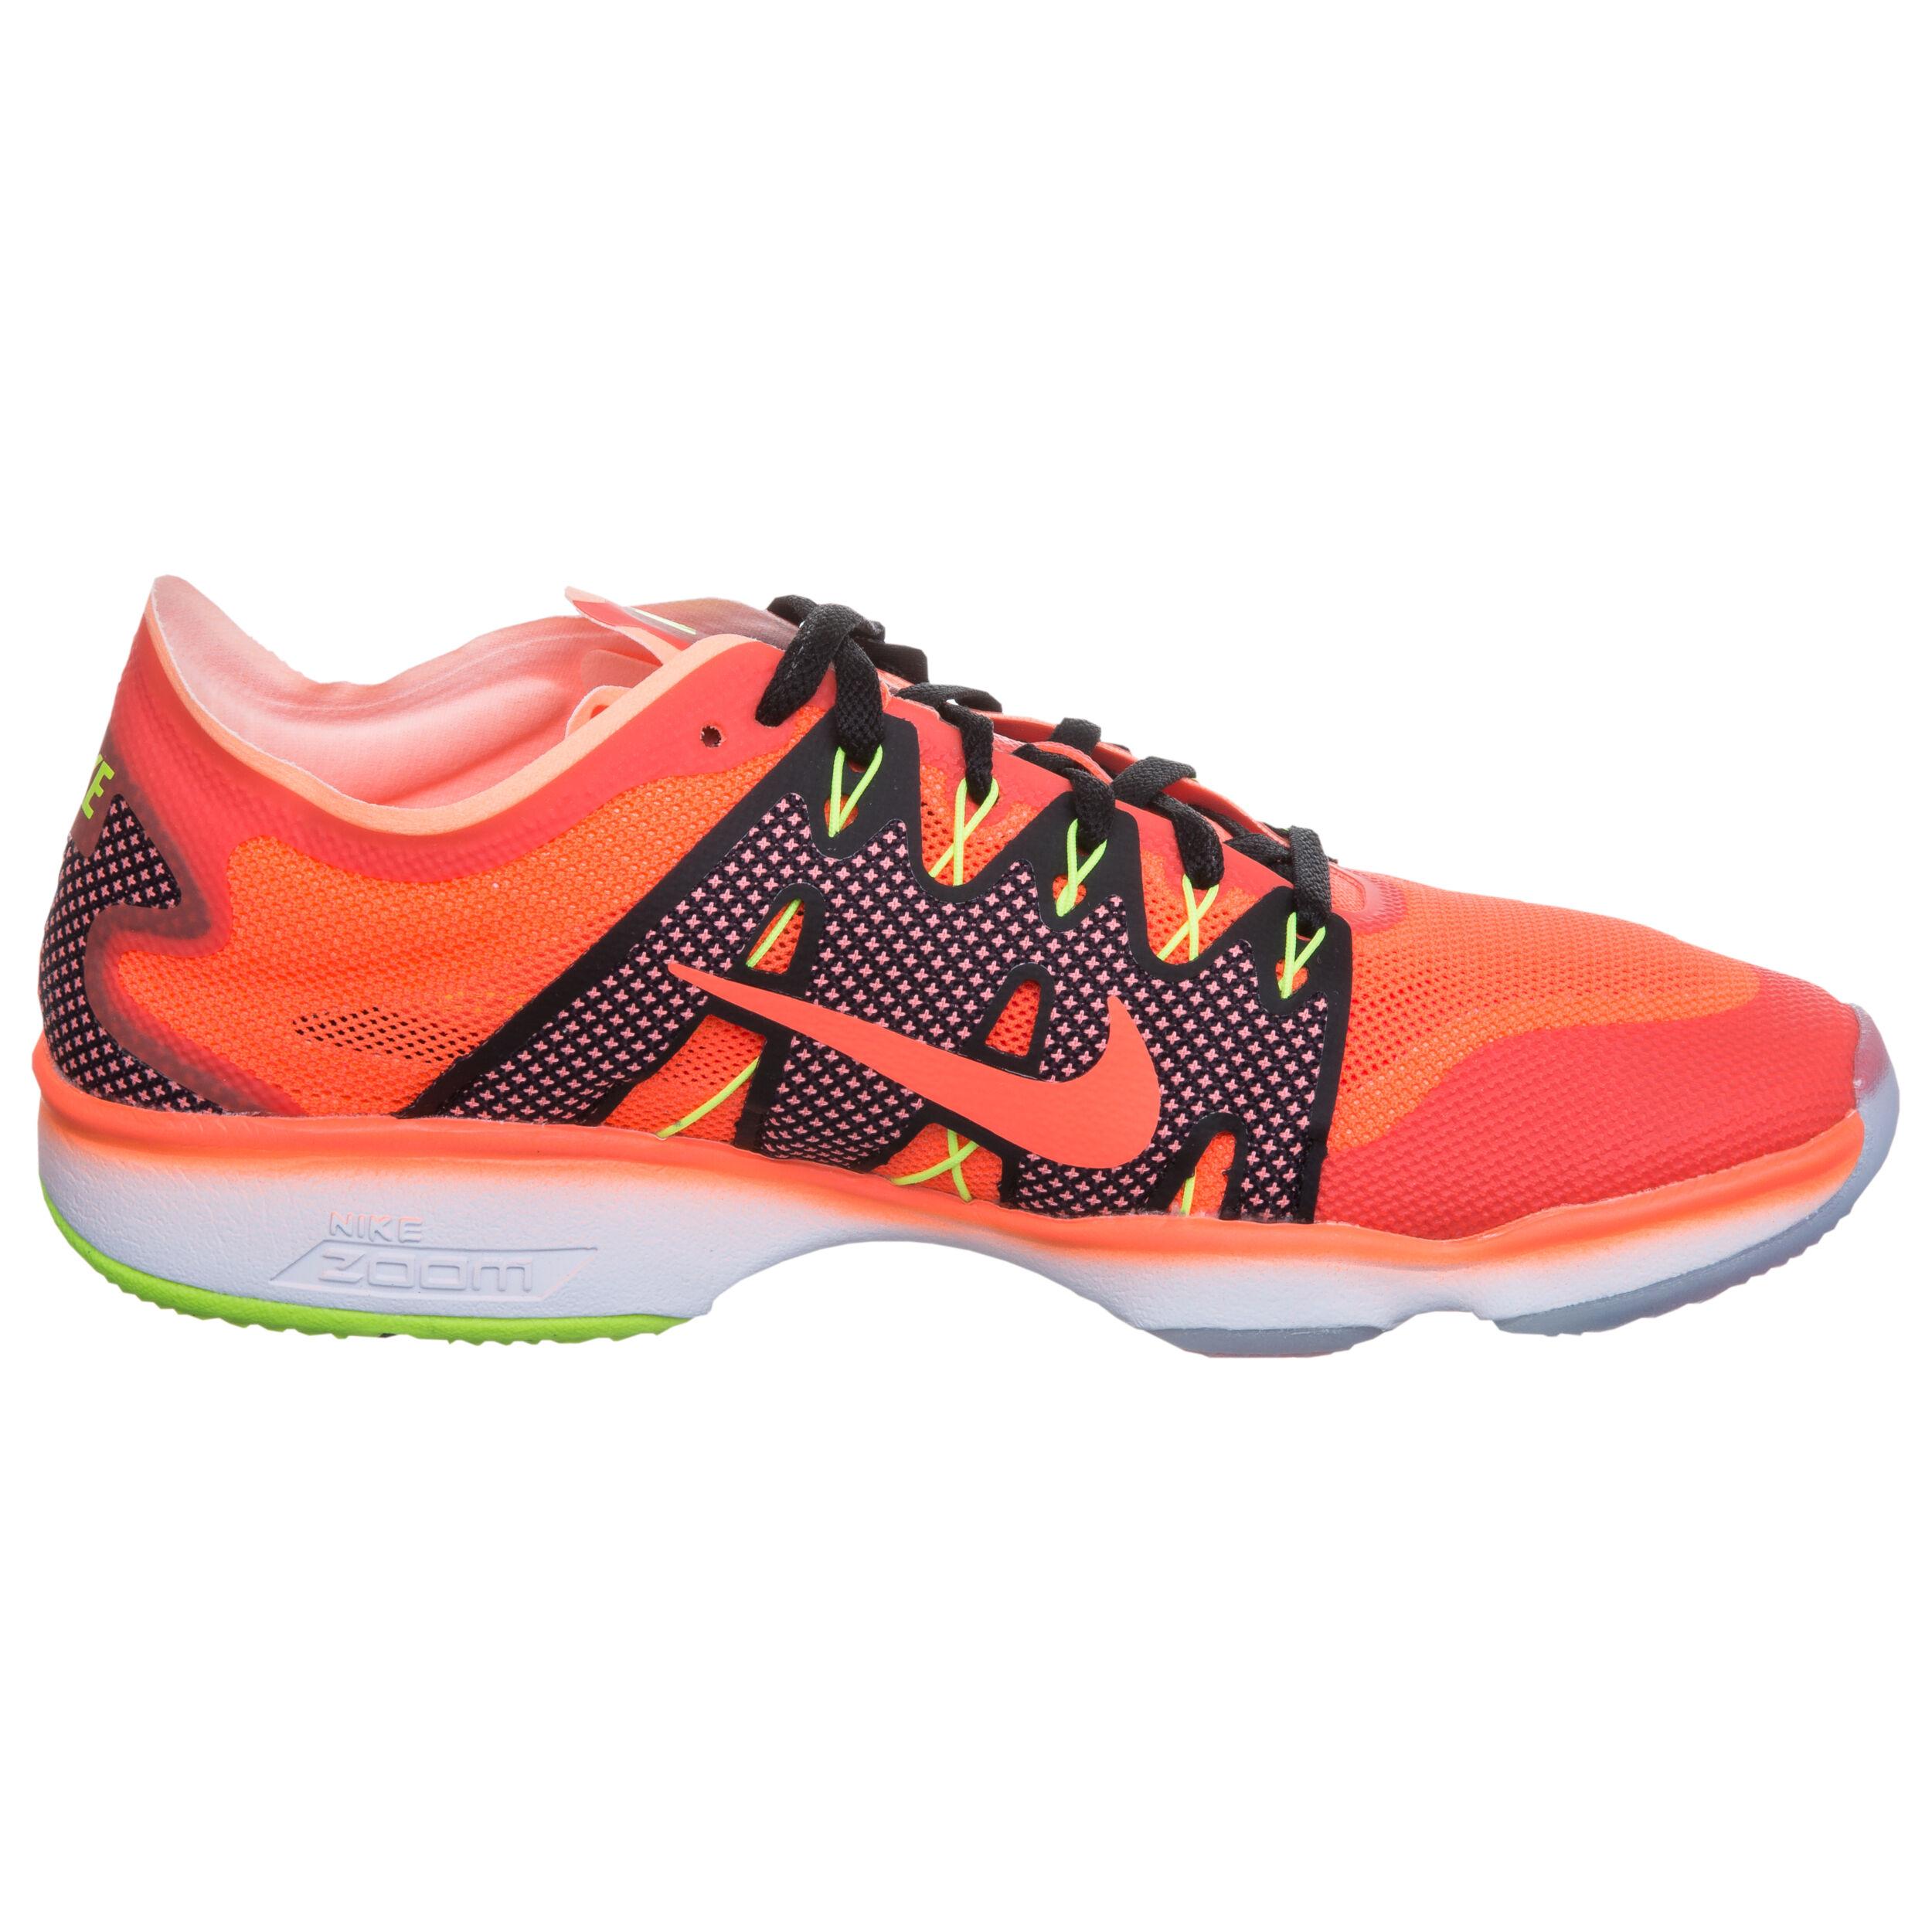 Neonorange Damen Zoom 2 Nike Fitnessschuh Agility Fit XlkiTwZPOu